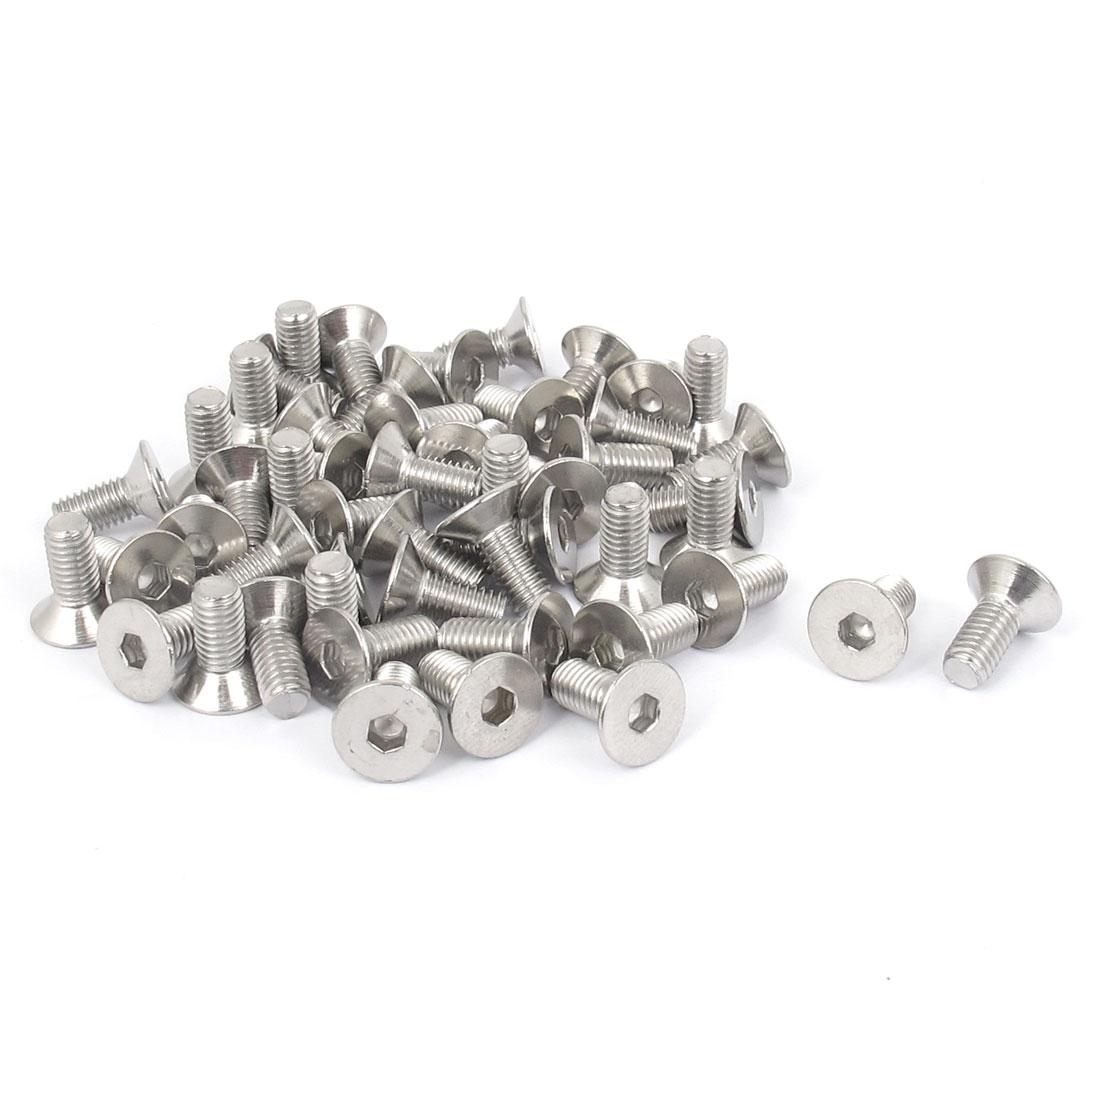 Unique Bargains M5 x 12mm 304 Stainless Steel Hex Socket Countersunk Flat Head Screw Bolts 50pcs